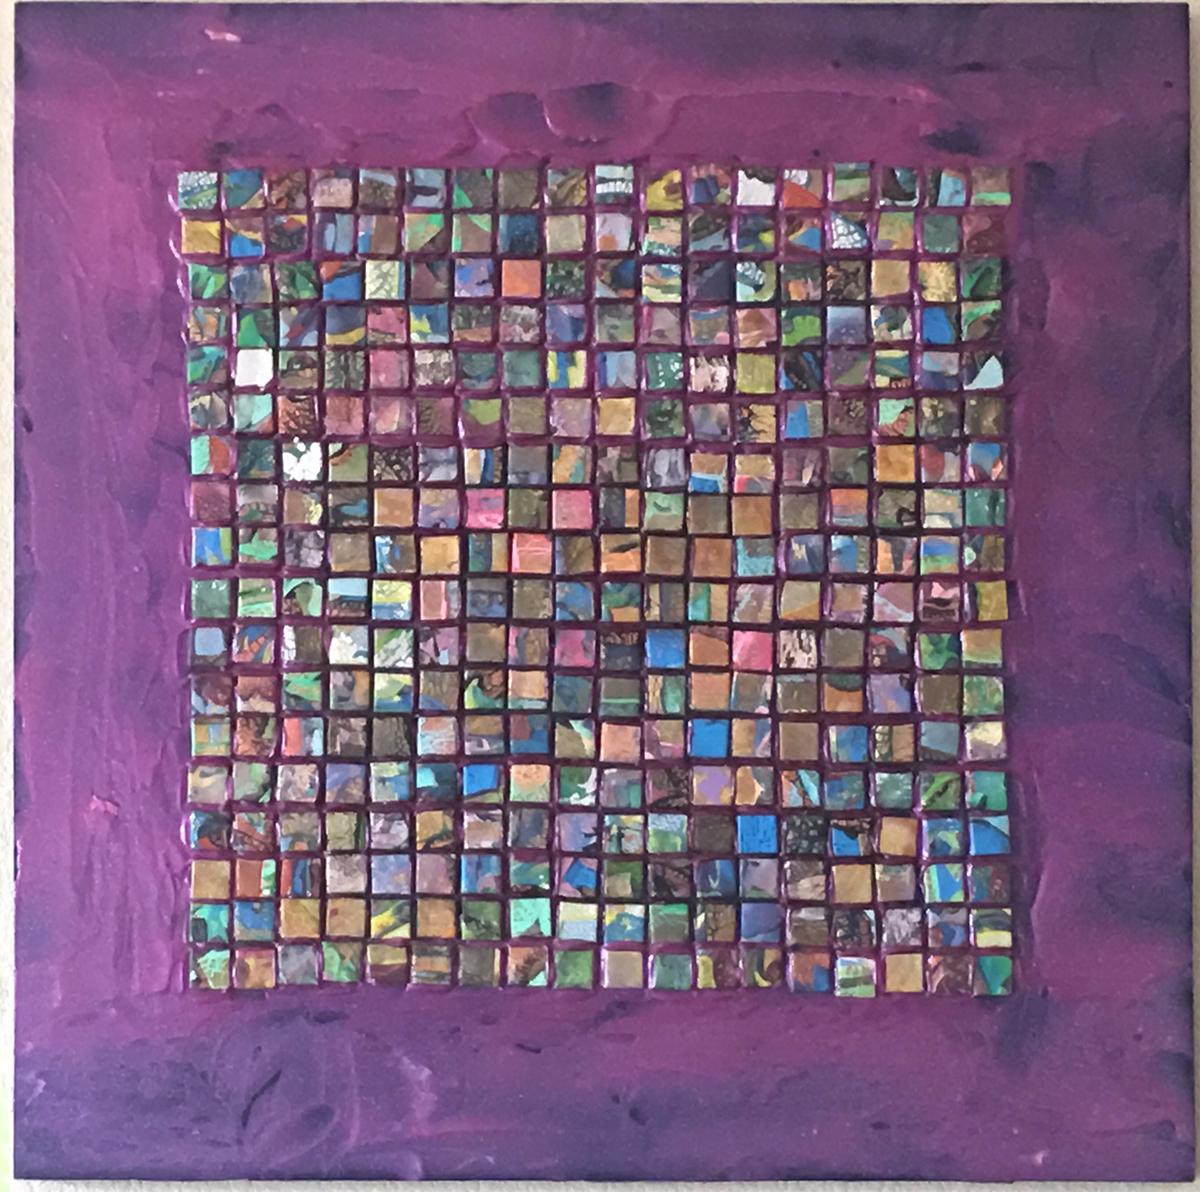 Tile Piece 3, Mixed Media, circa 1995, by Ann Stretton